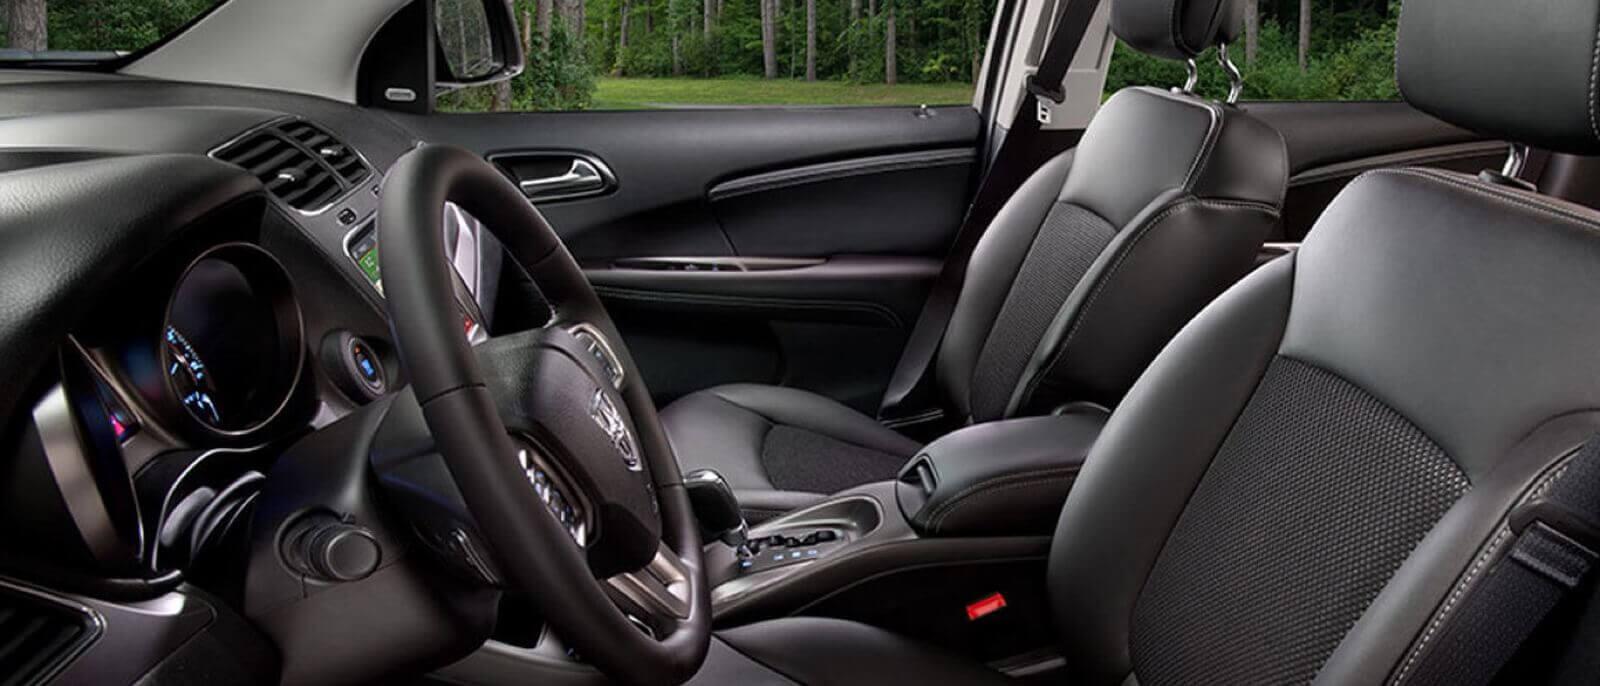 2016-Dodge-Journey Interior